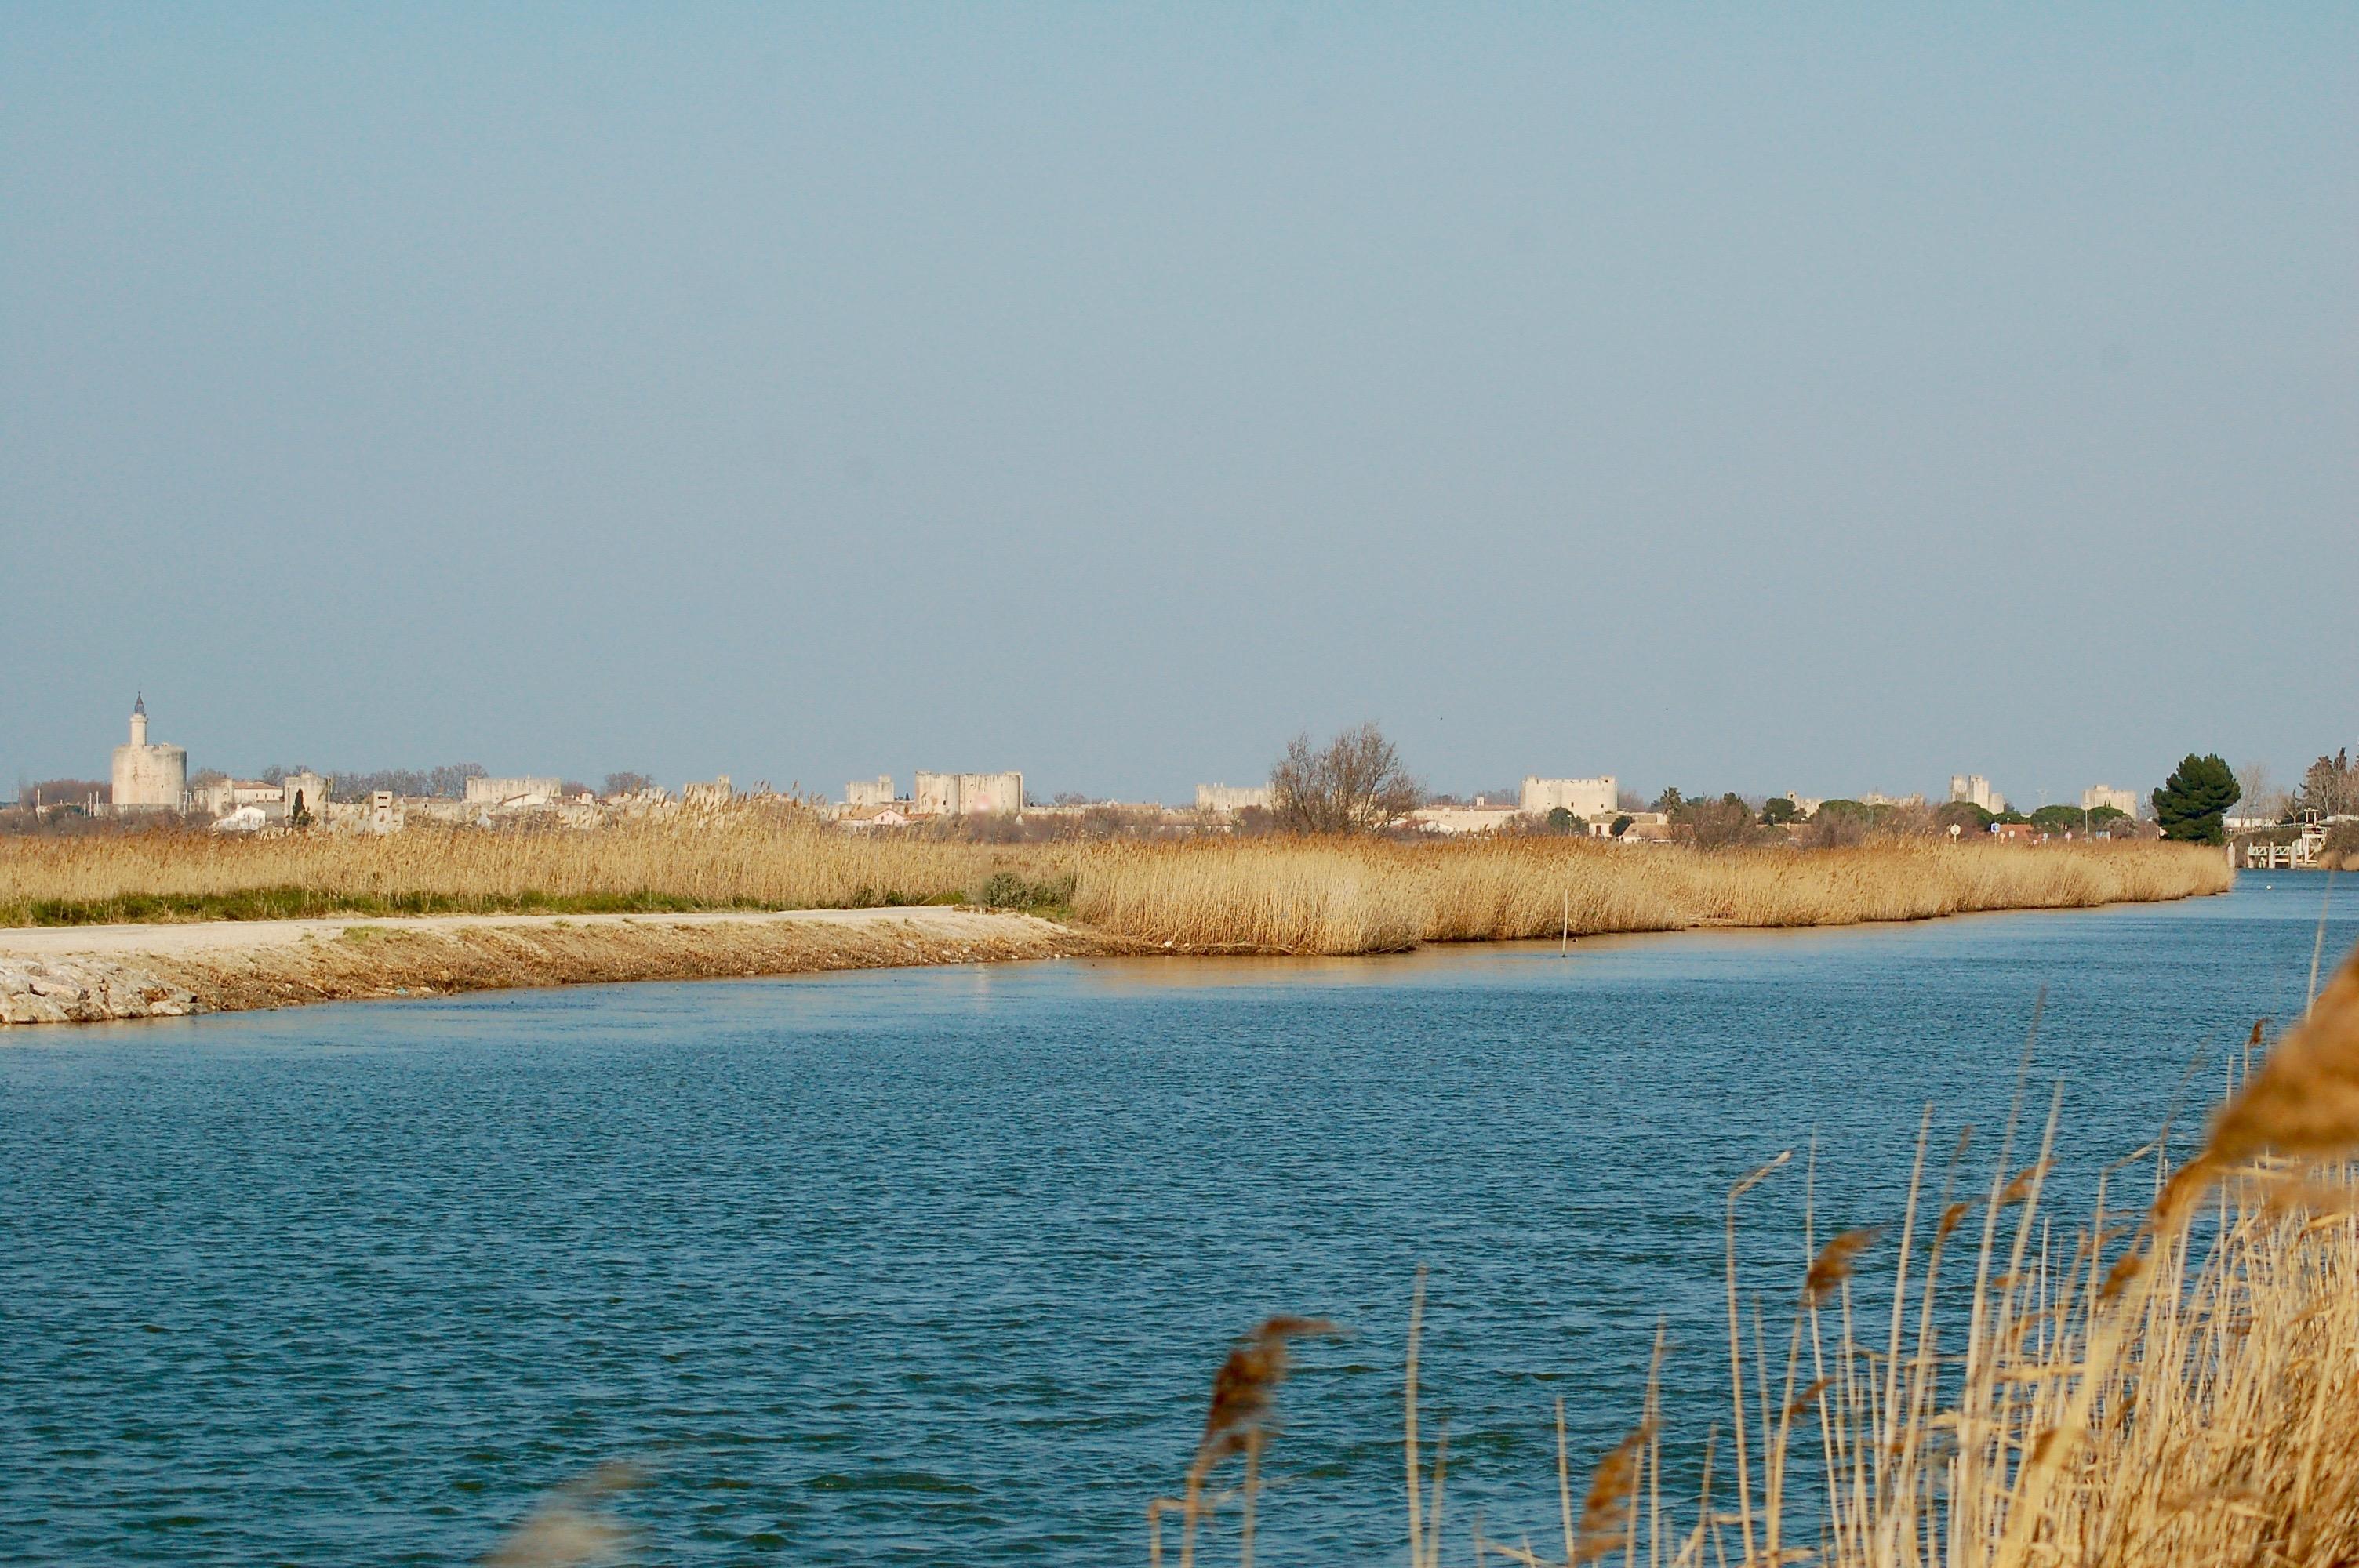 Wetland Camargue